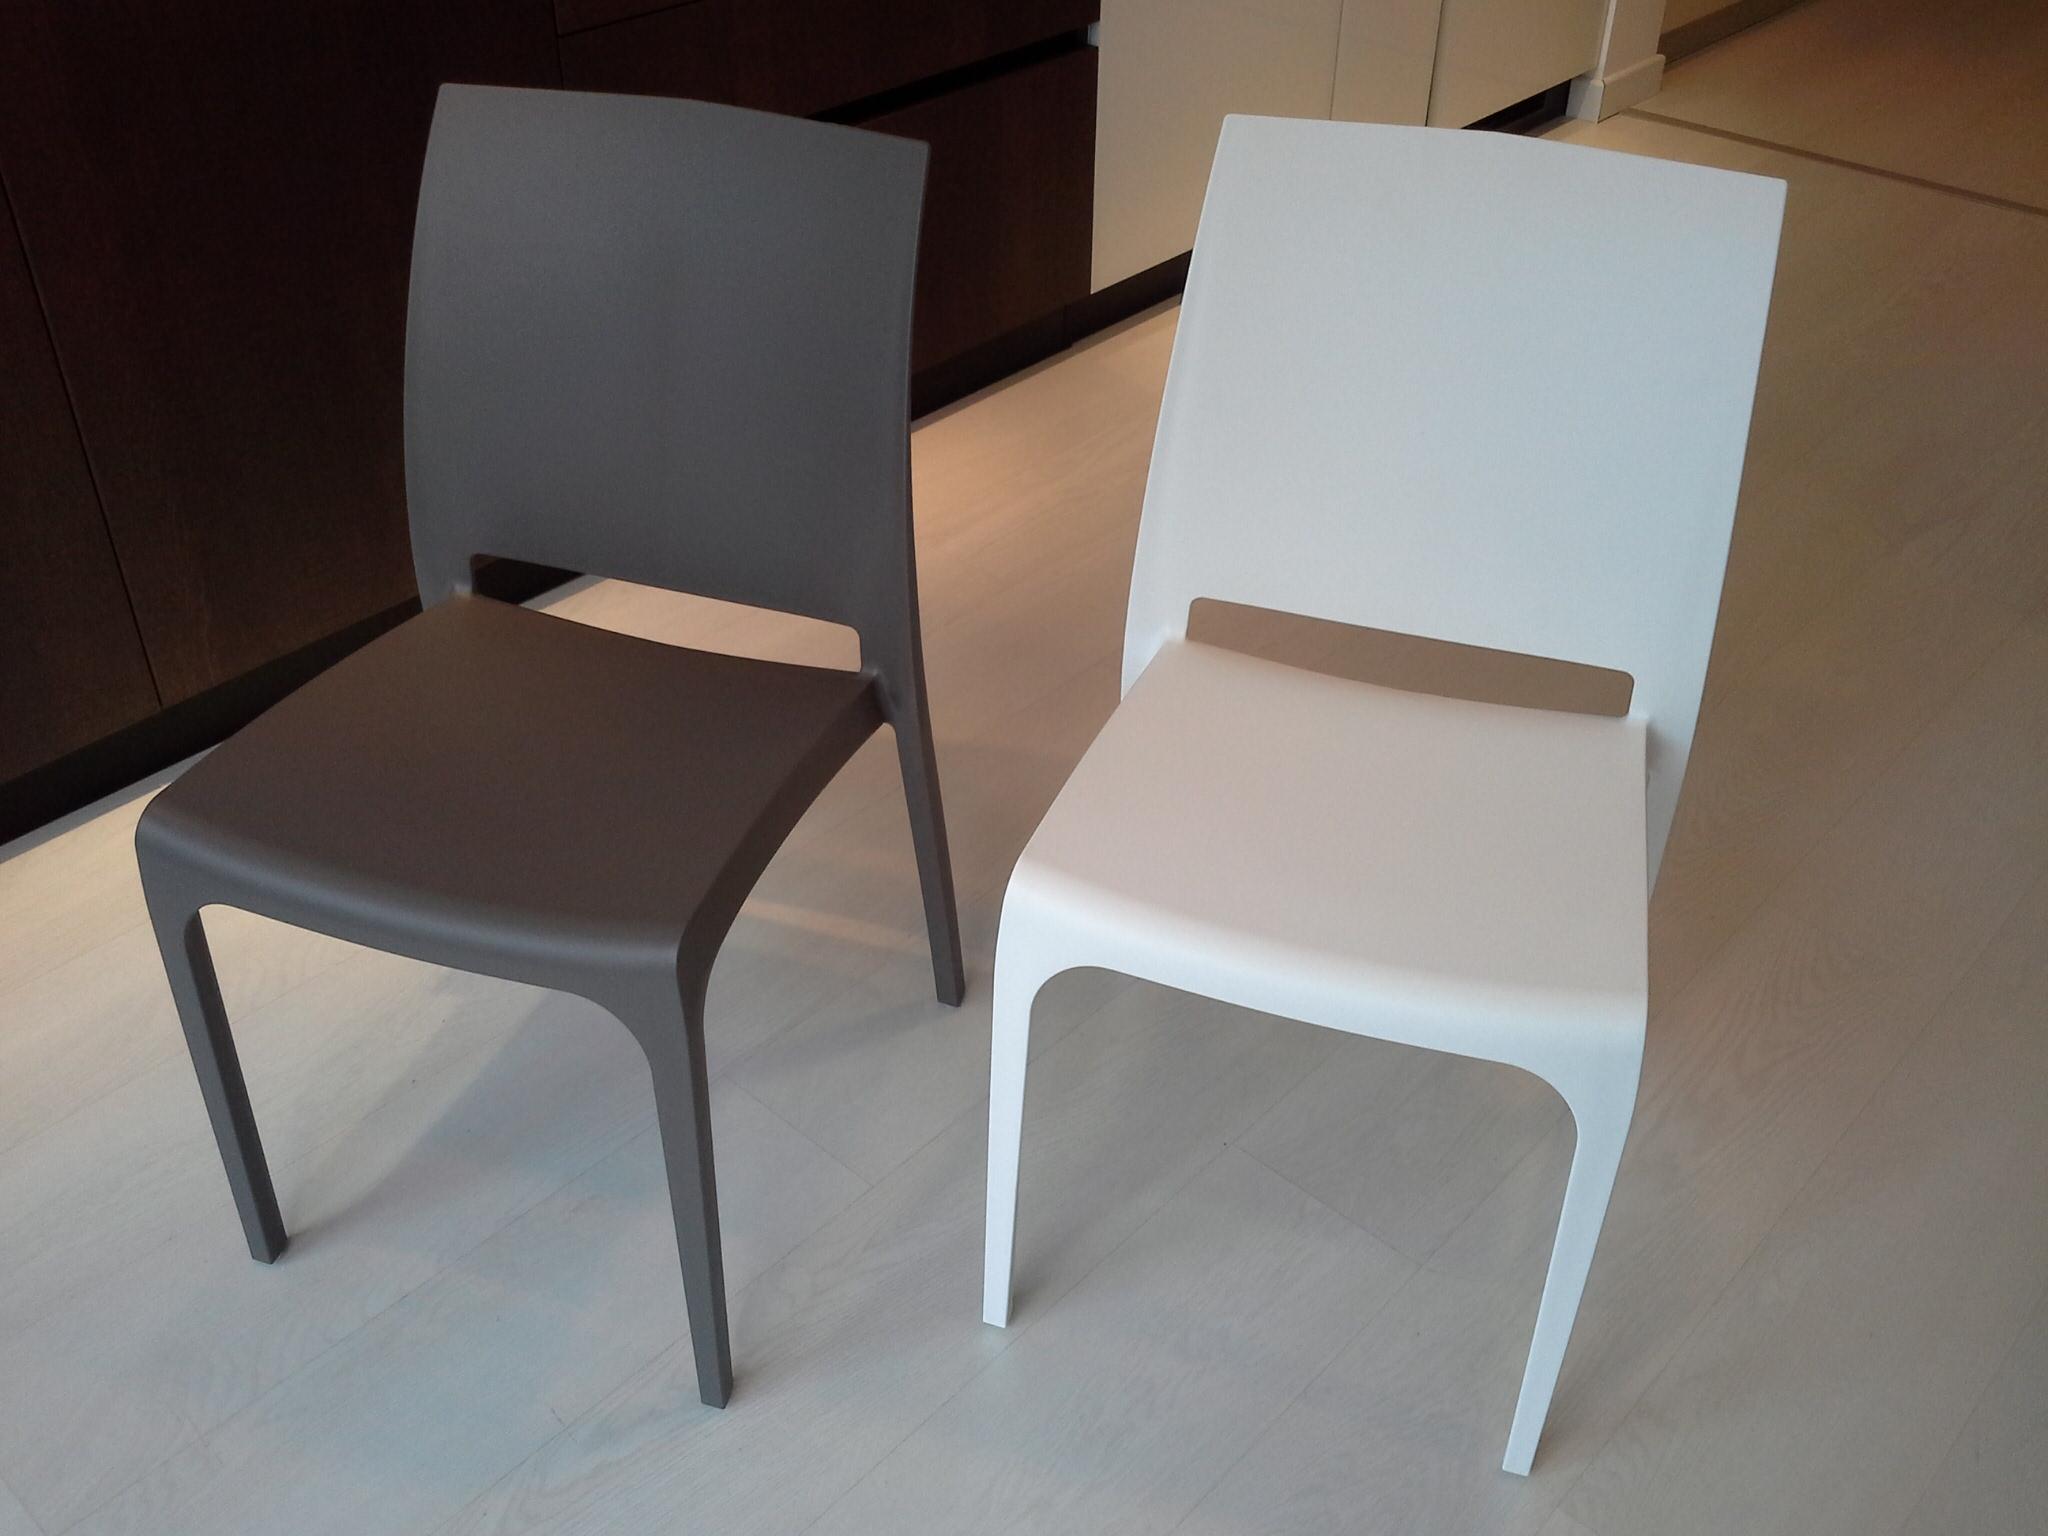 sedia polipropilene vari colori sedie a prezzi scontati